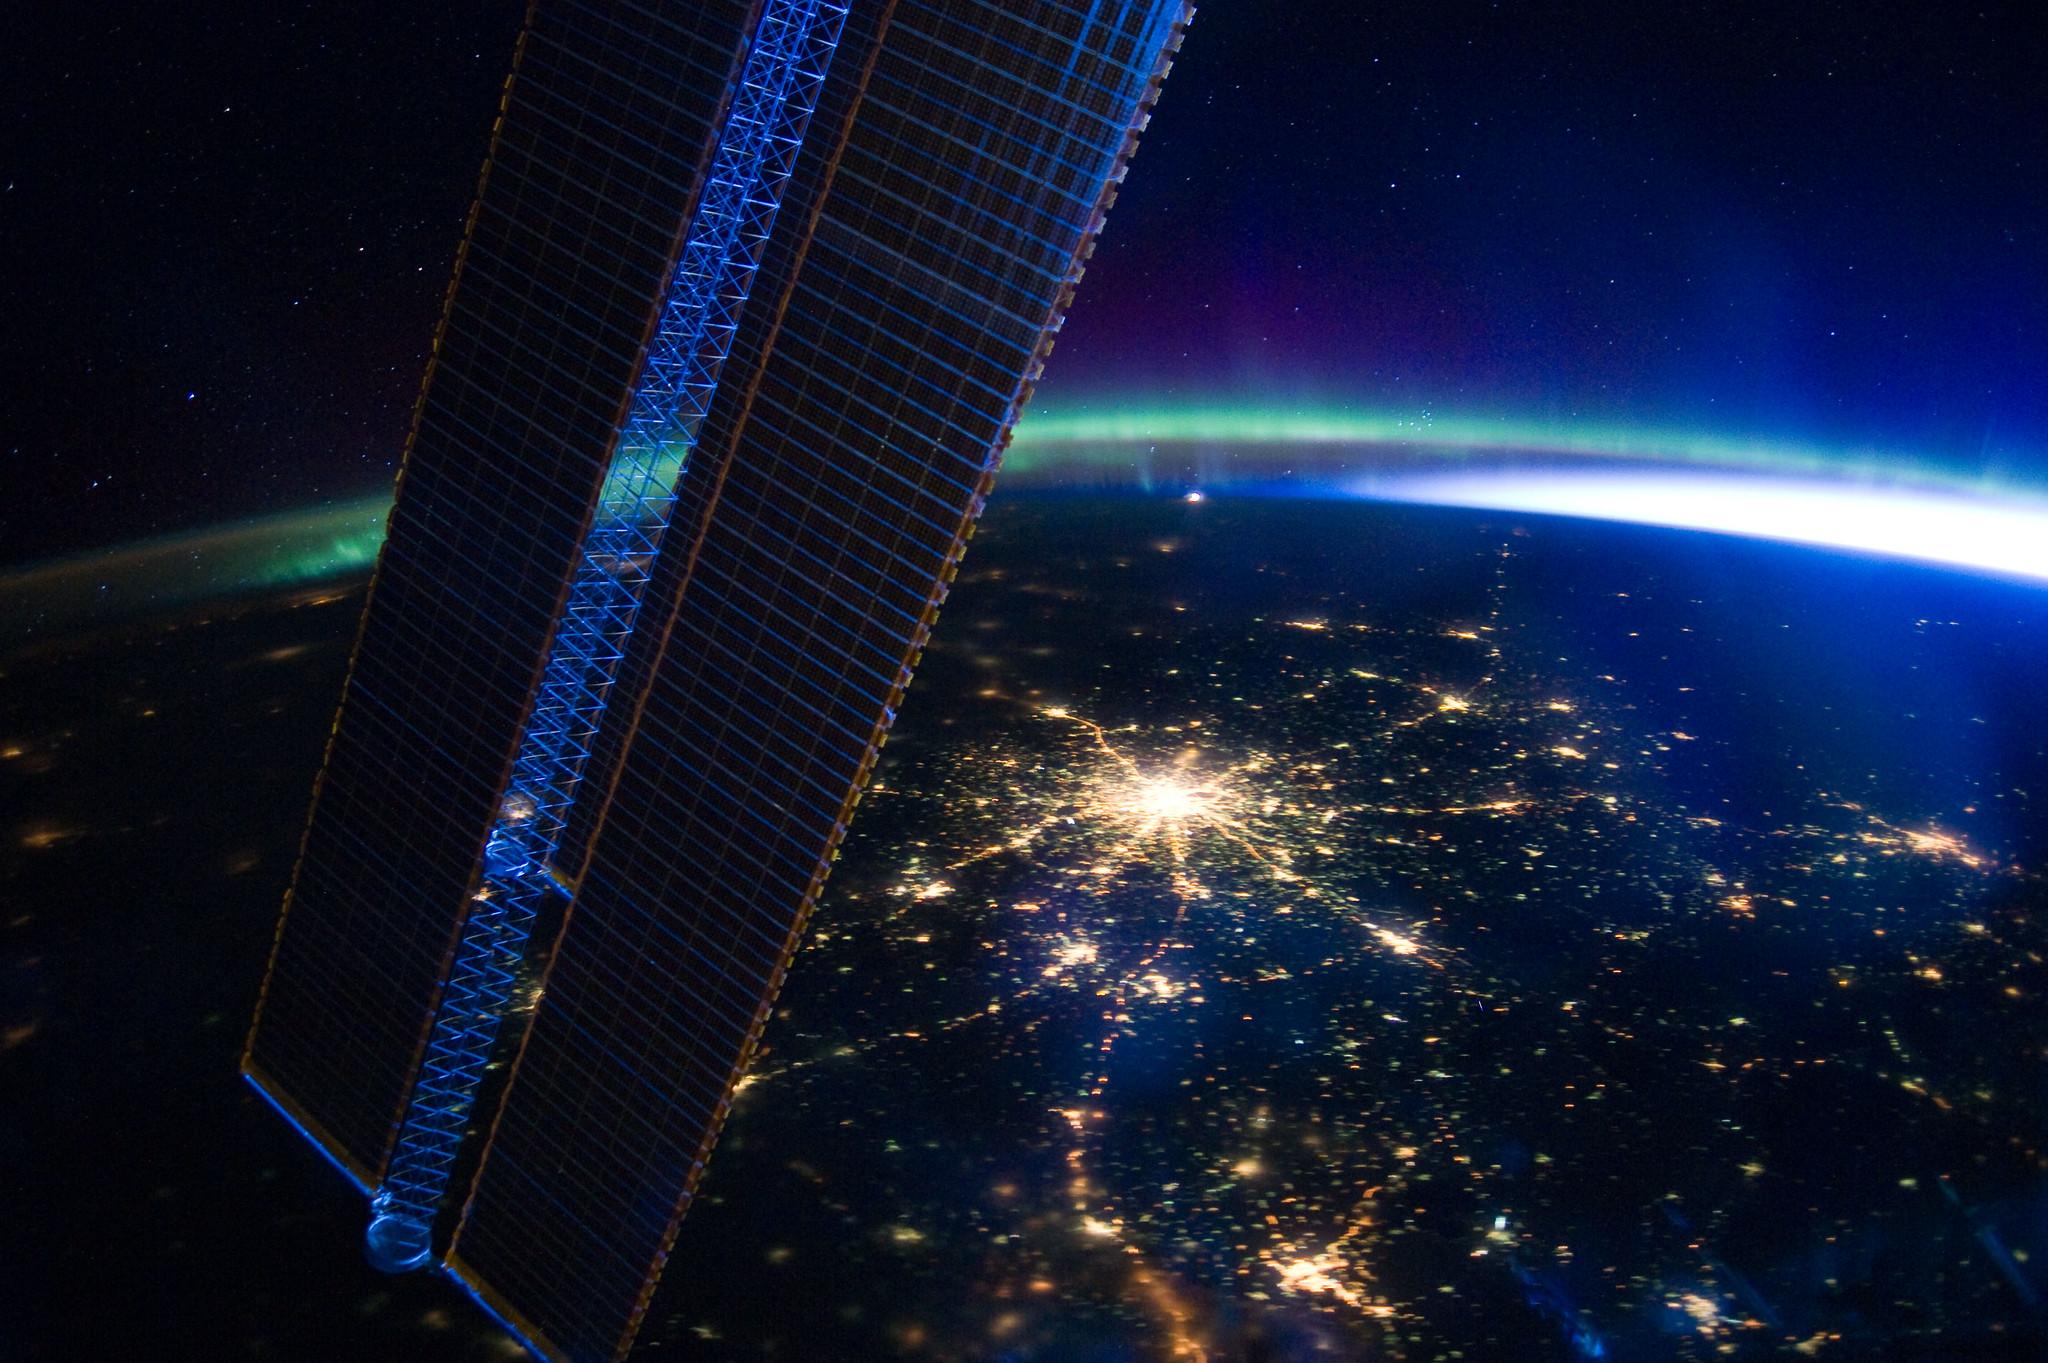 space station nasa - photo #45